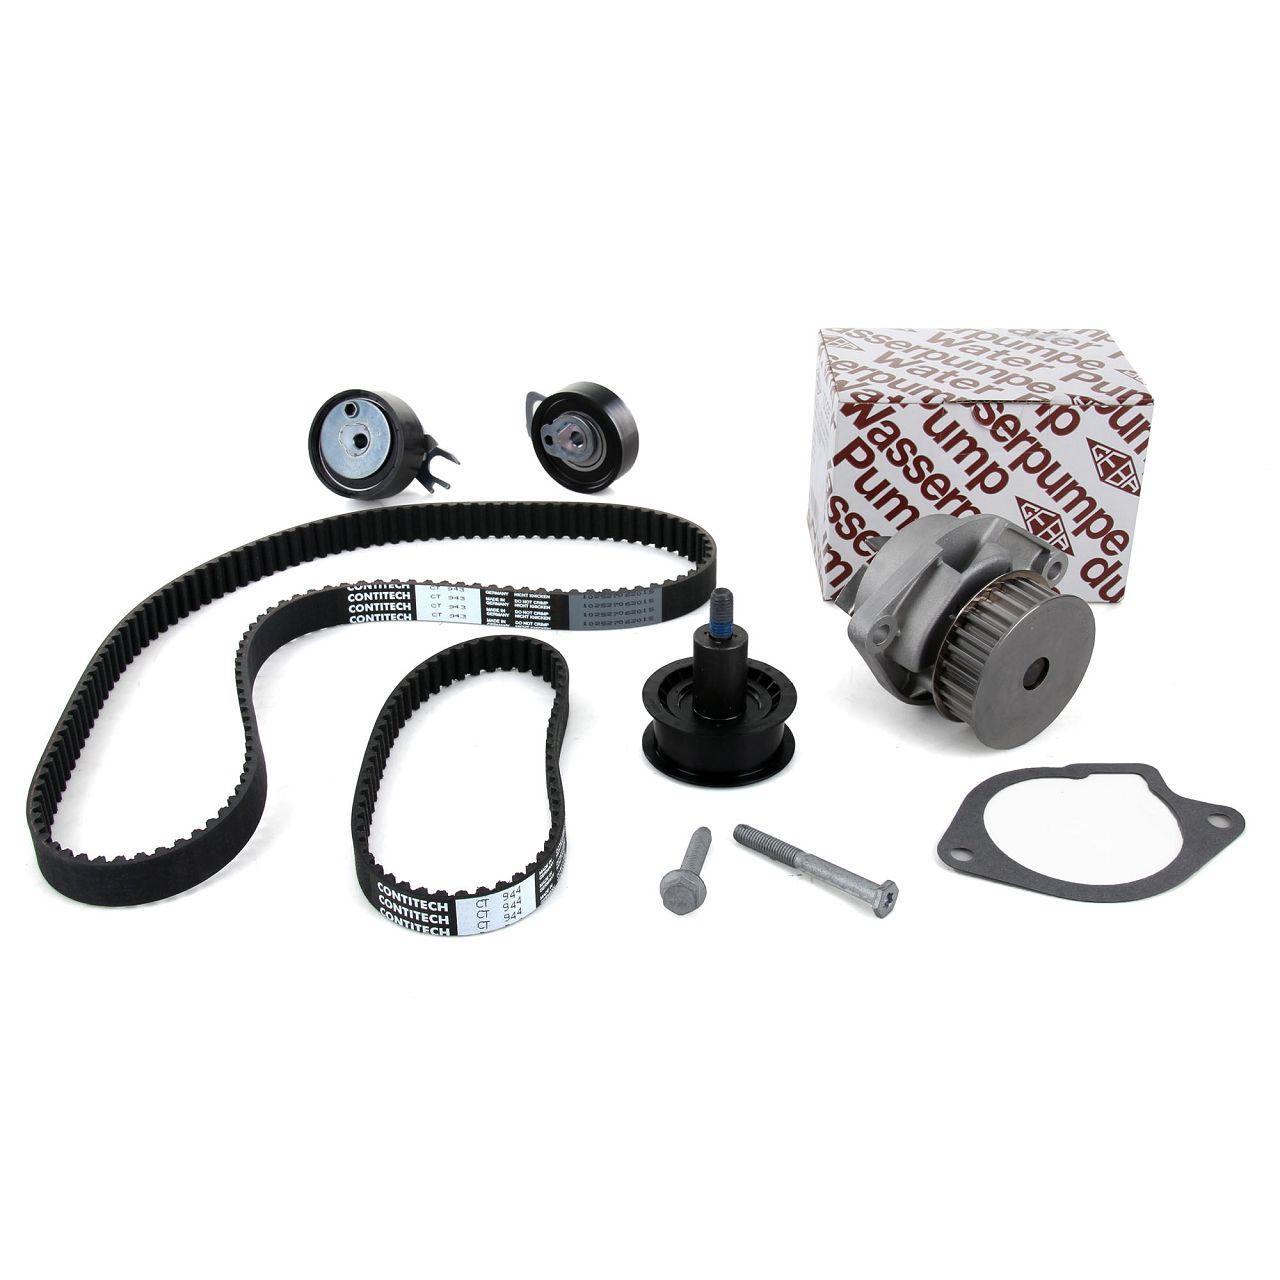 Zahnriemensatz 036198119C + GEBA Wasserpumpe 036121008MX SEAT SKODA VW 1.4 16V